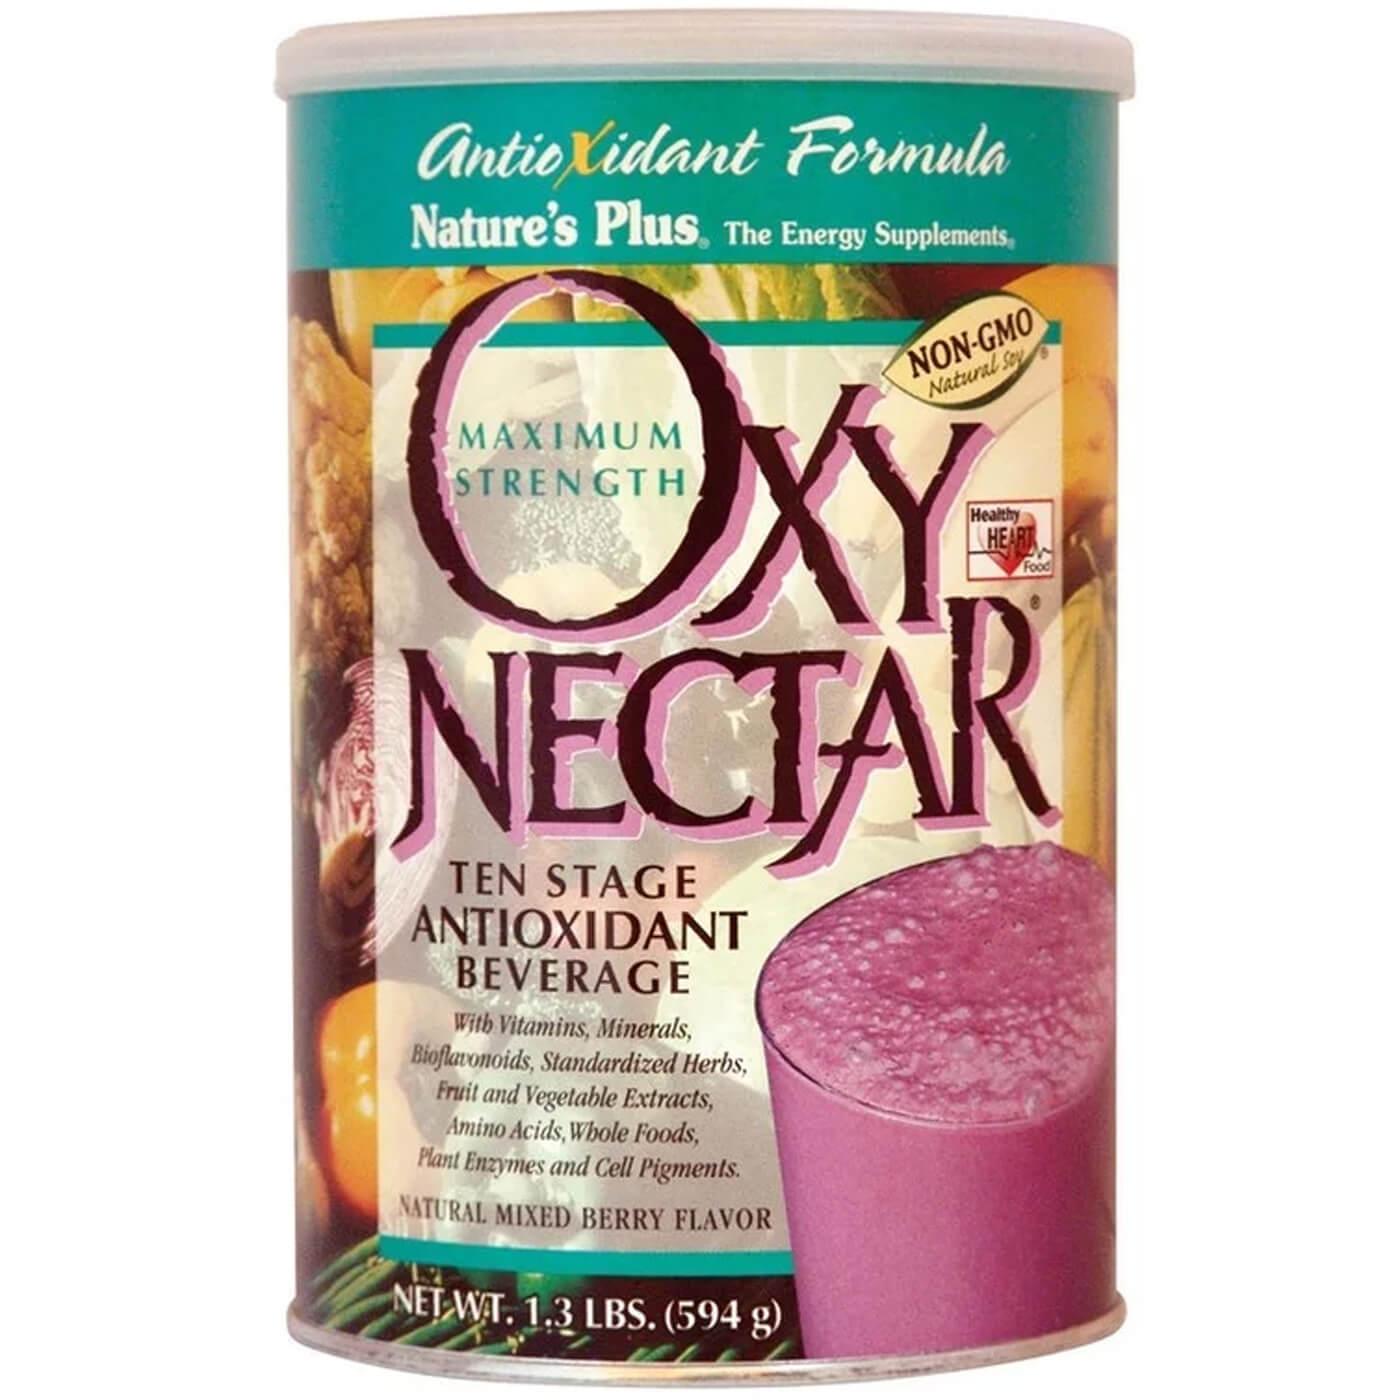 Natures Plus Oxy Nectar Συμπλήρωμα Διατροφής Πανίσχυρης Αντιοξειδωτικής Φόρμουλας για Έξτρα Ενέργεια 594gr (1.3lbr)